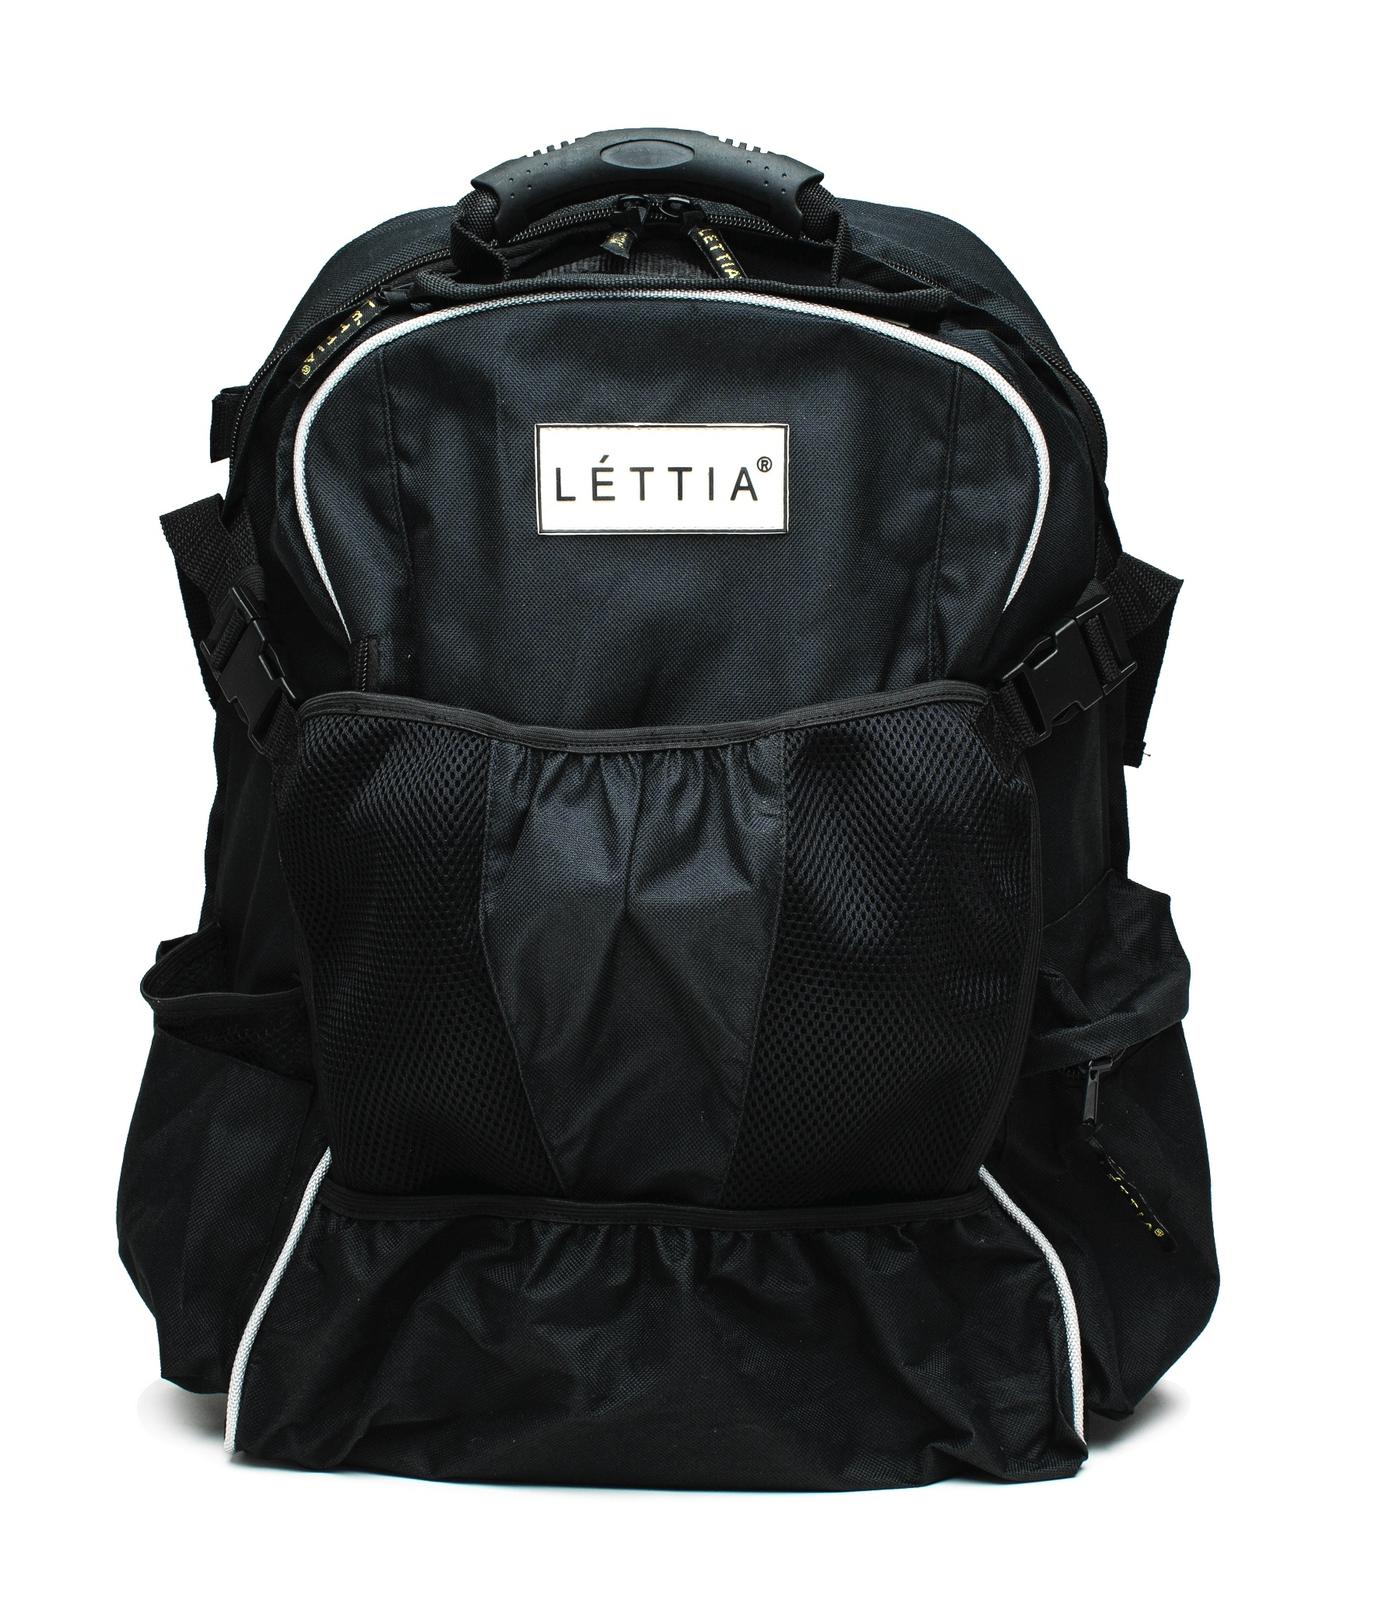 Lettia Equestrian Backpack